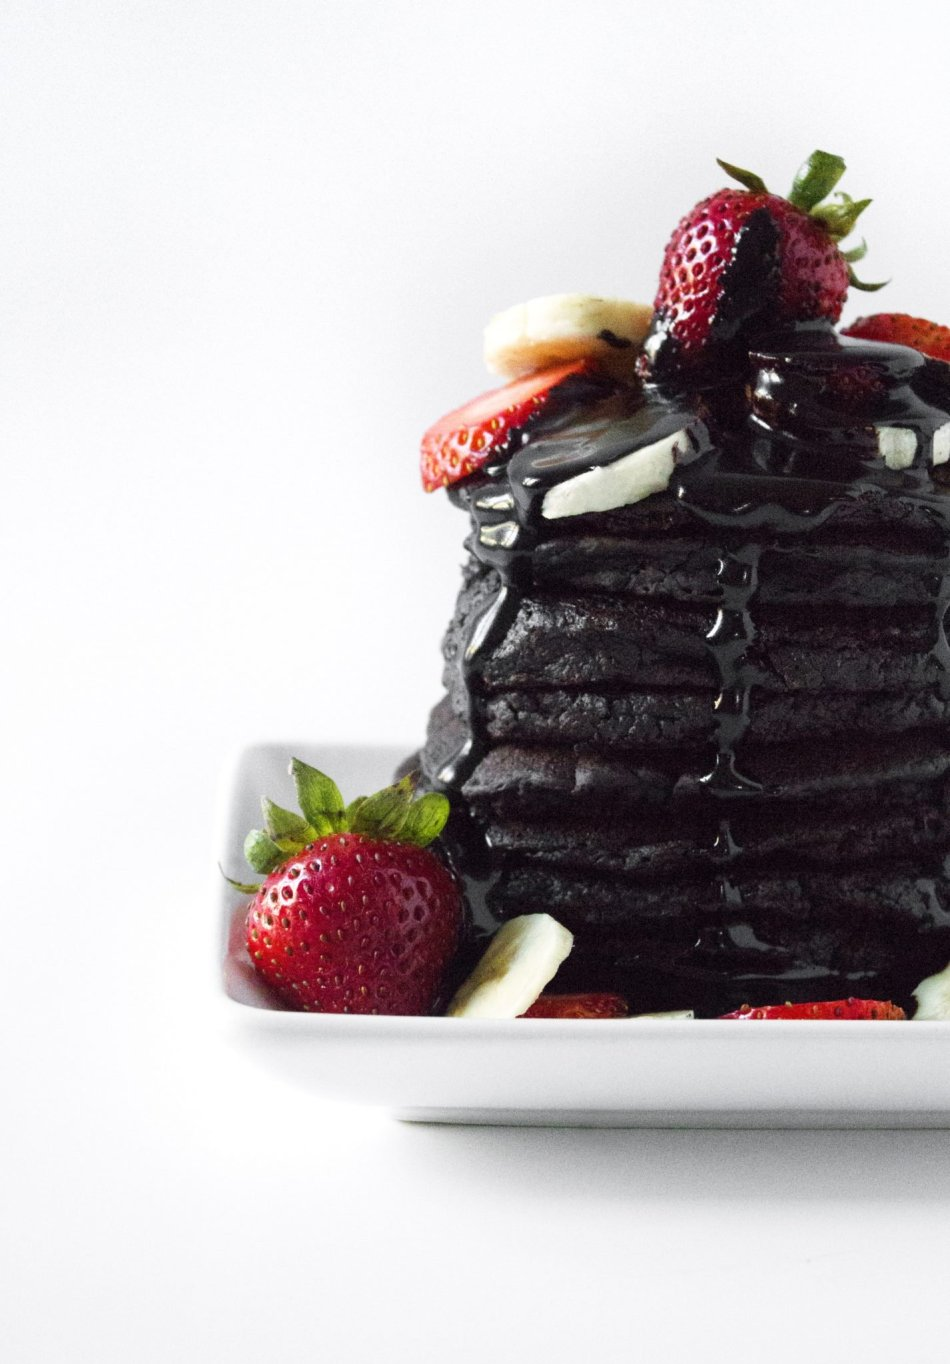 Chocolate Zucchini Pancakes | Gluten, dairy, & refined sugar free. Also vegan friendly.